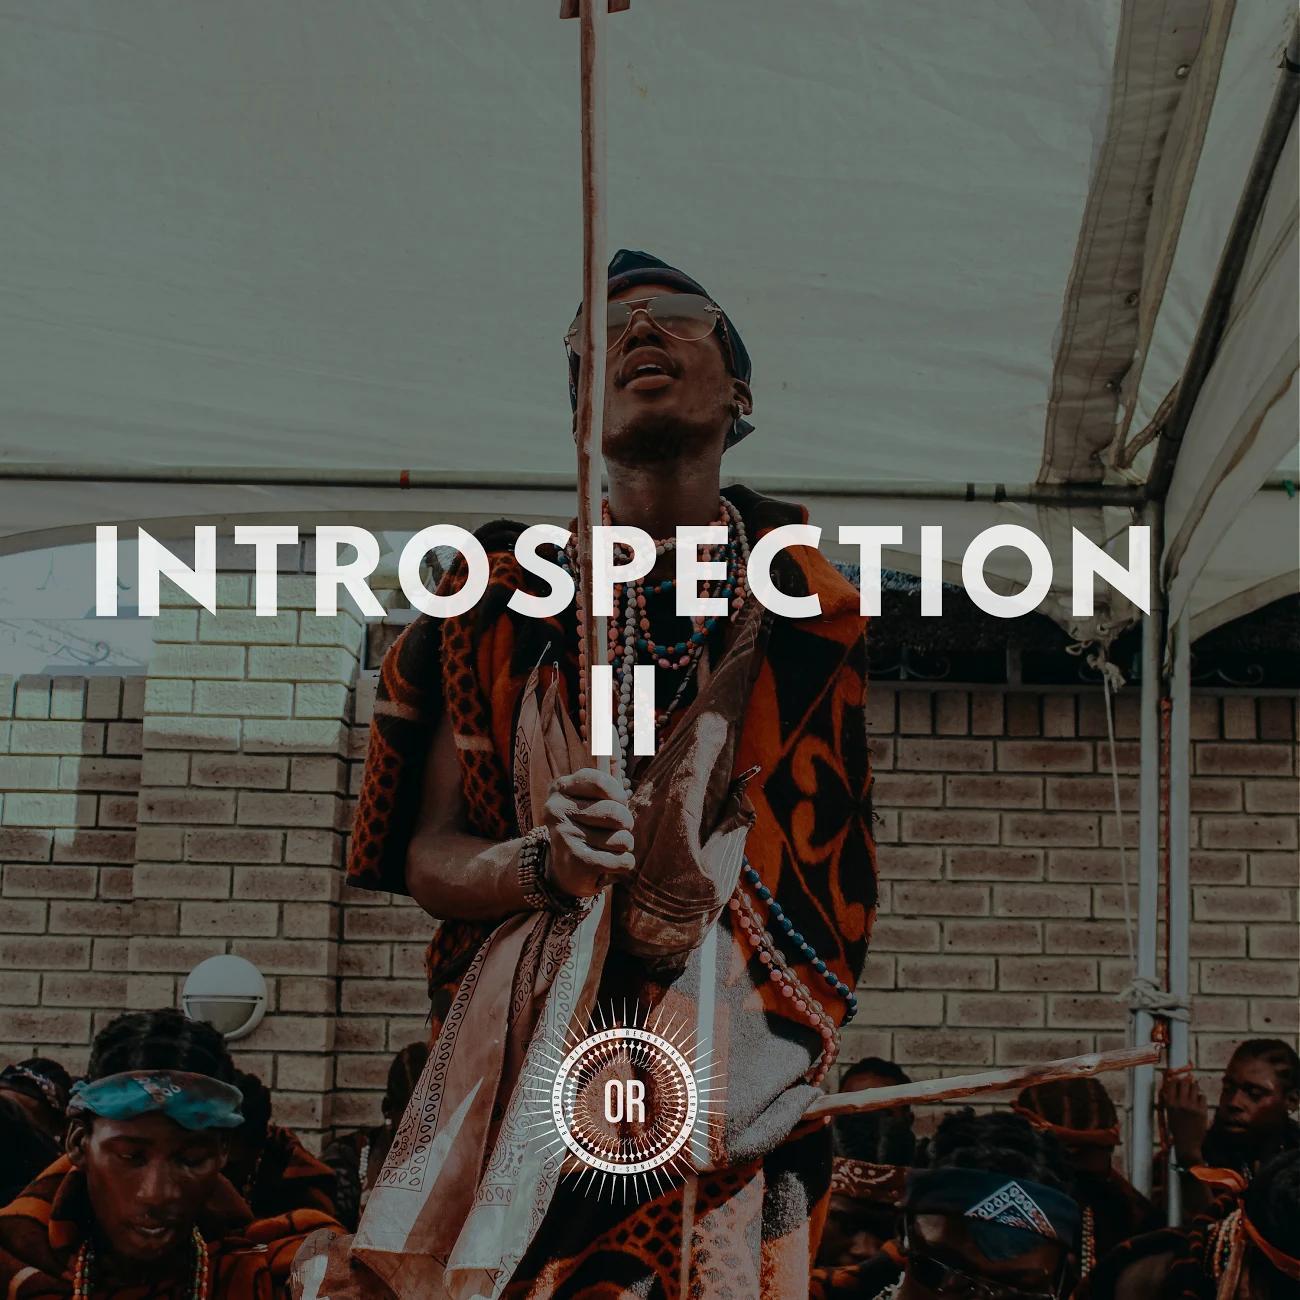 Gray Introspection (Part 2)